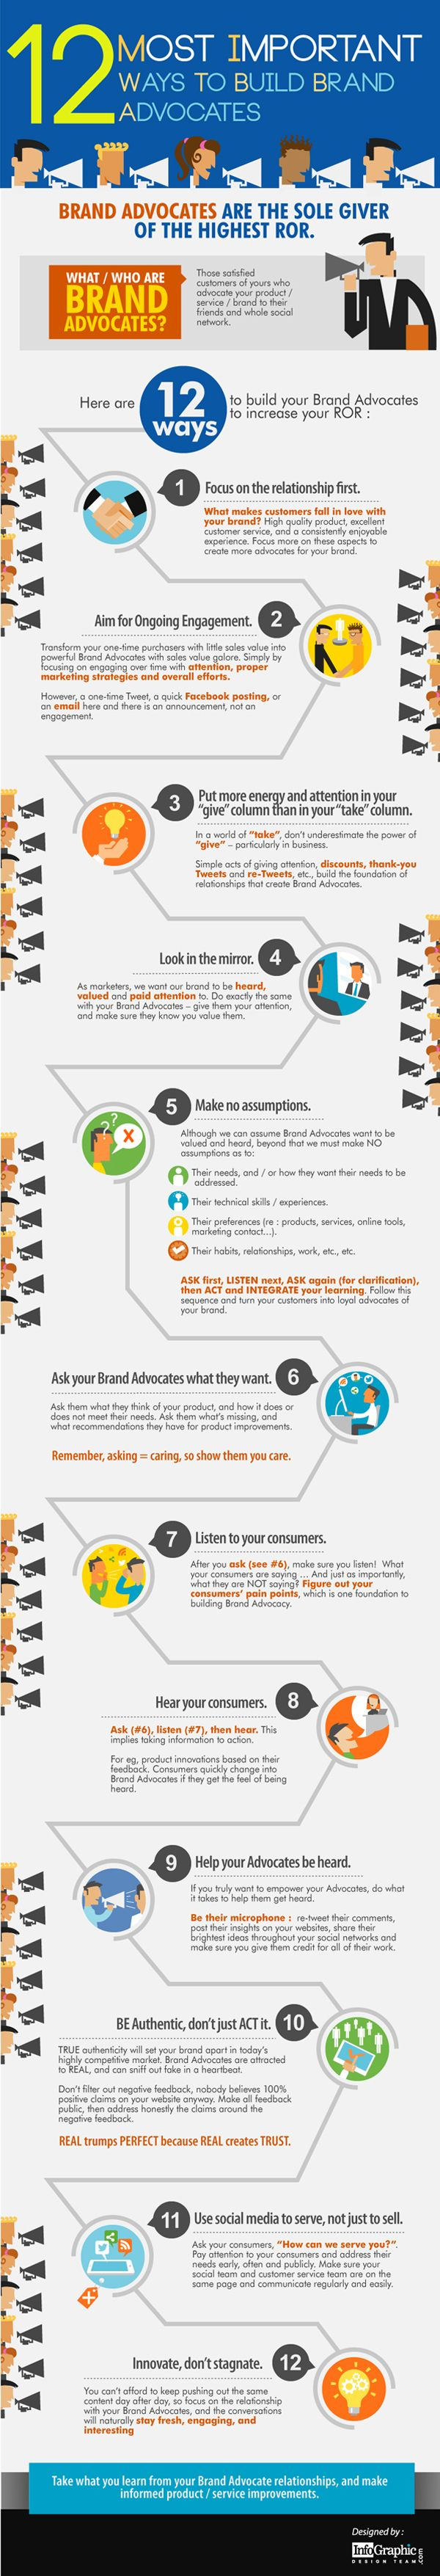 12 Ways To Build Brand Advocates